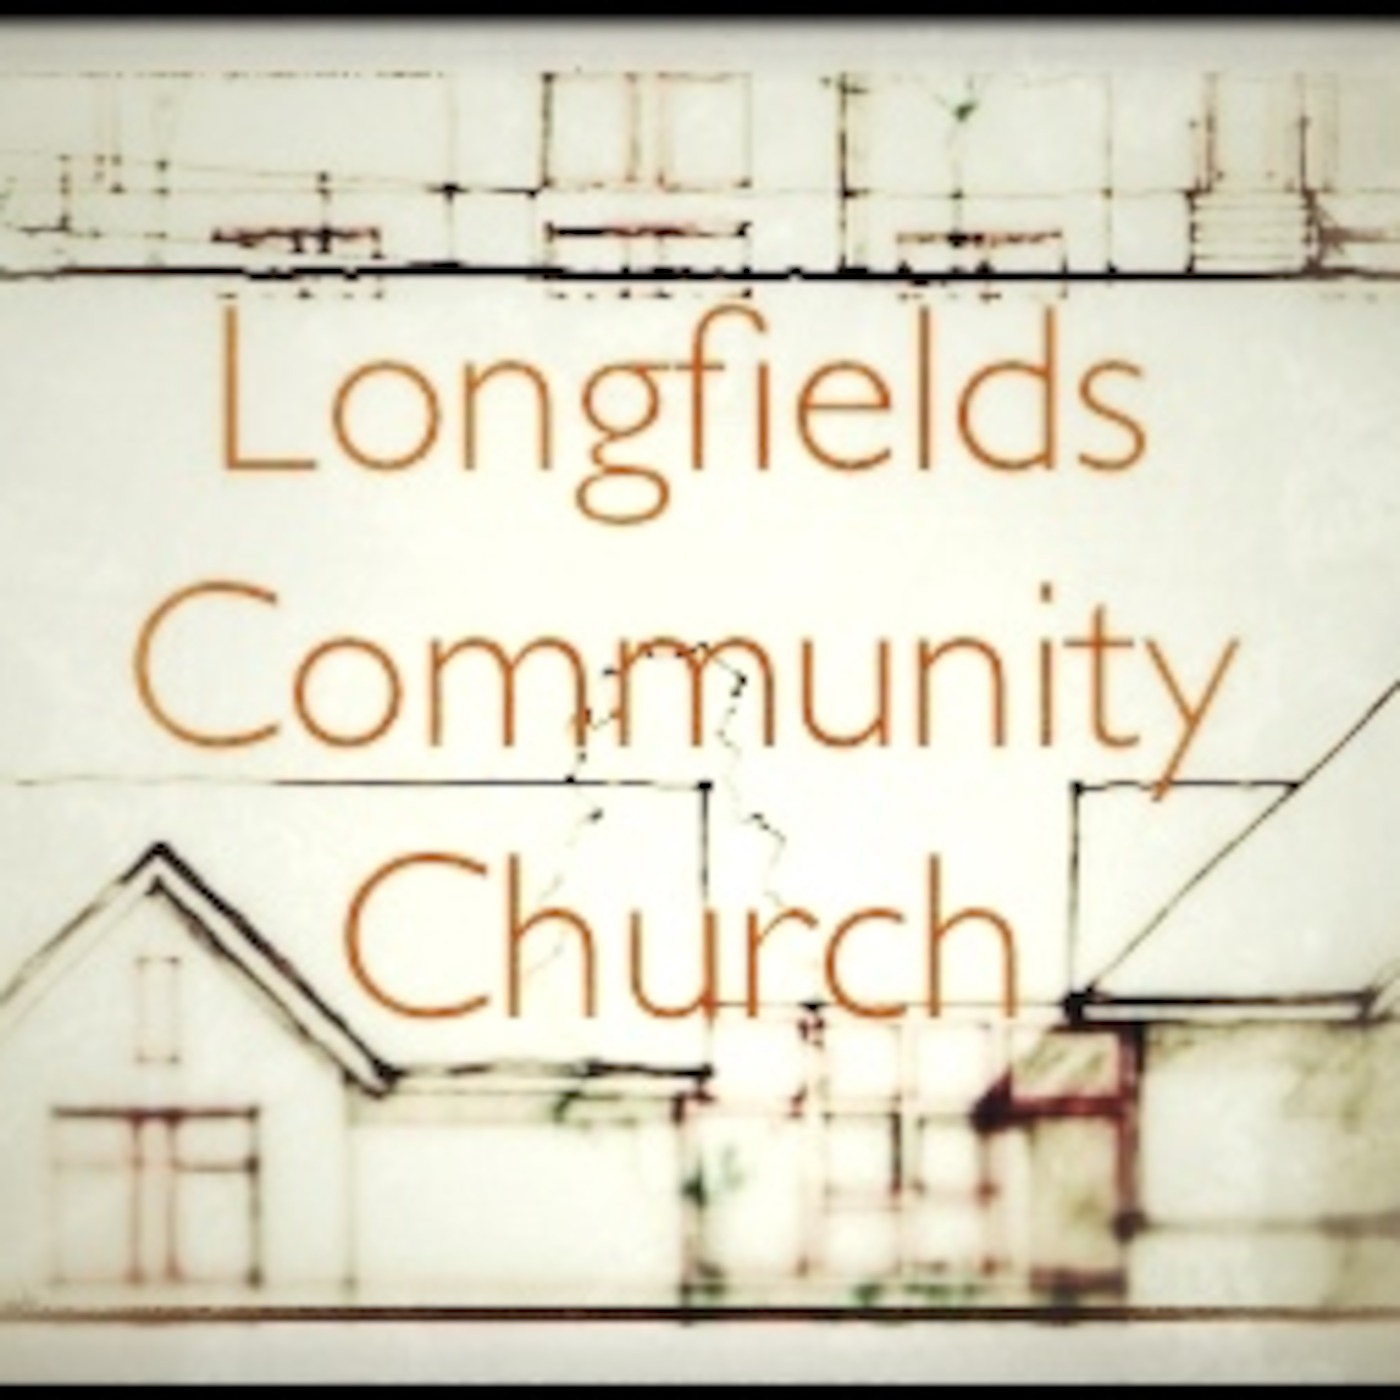 Longfields Community Church's Podcast